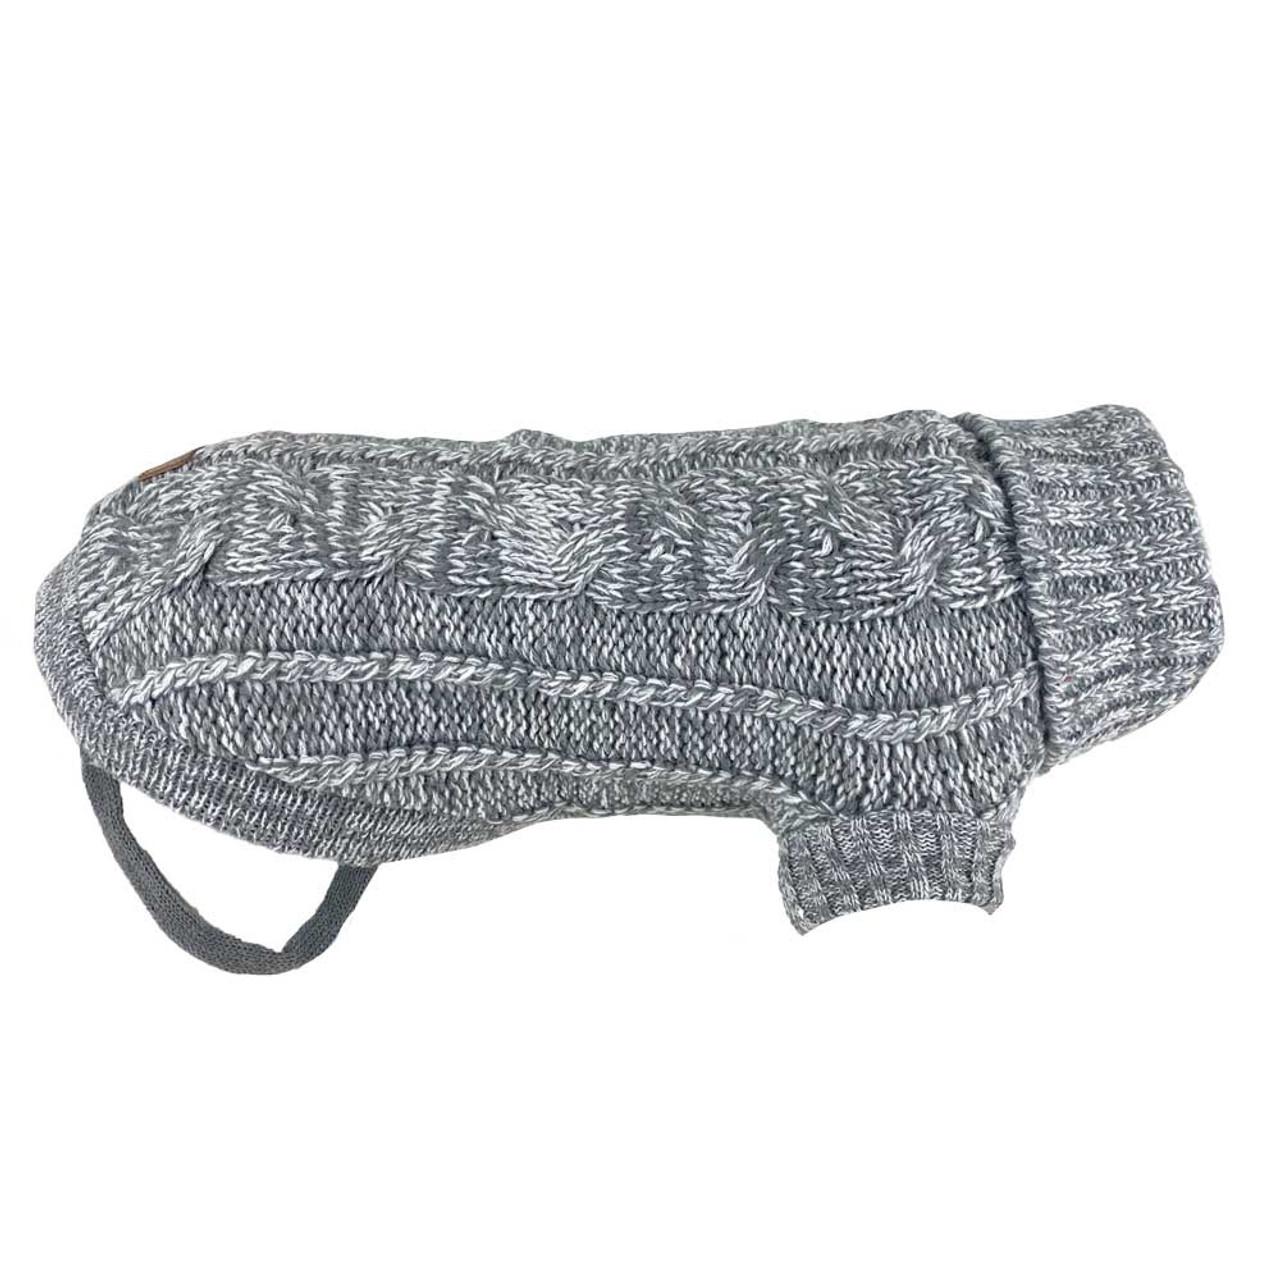 Huskimo Grey Cable Knit Jumper dog puppy winter apparel